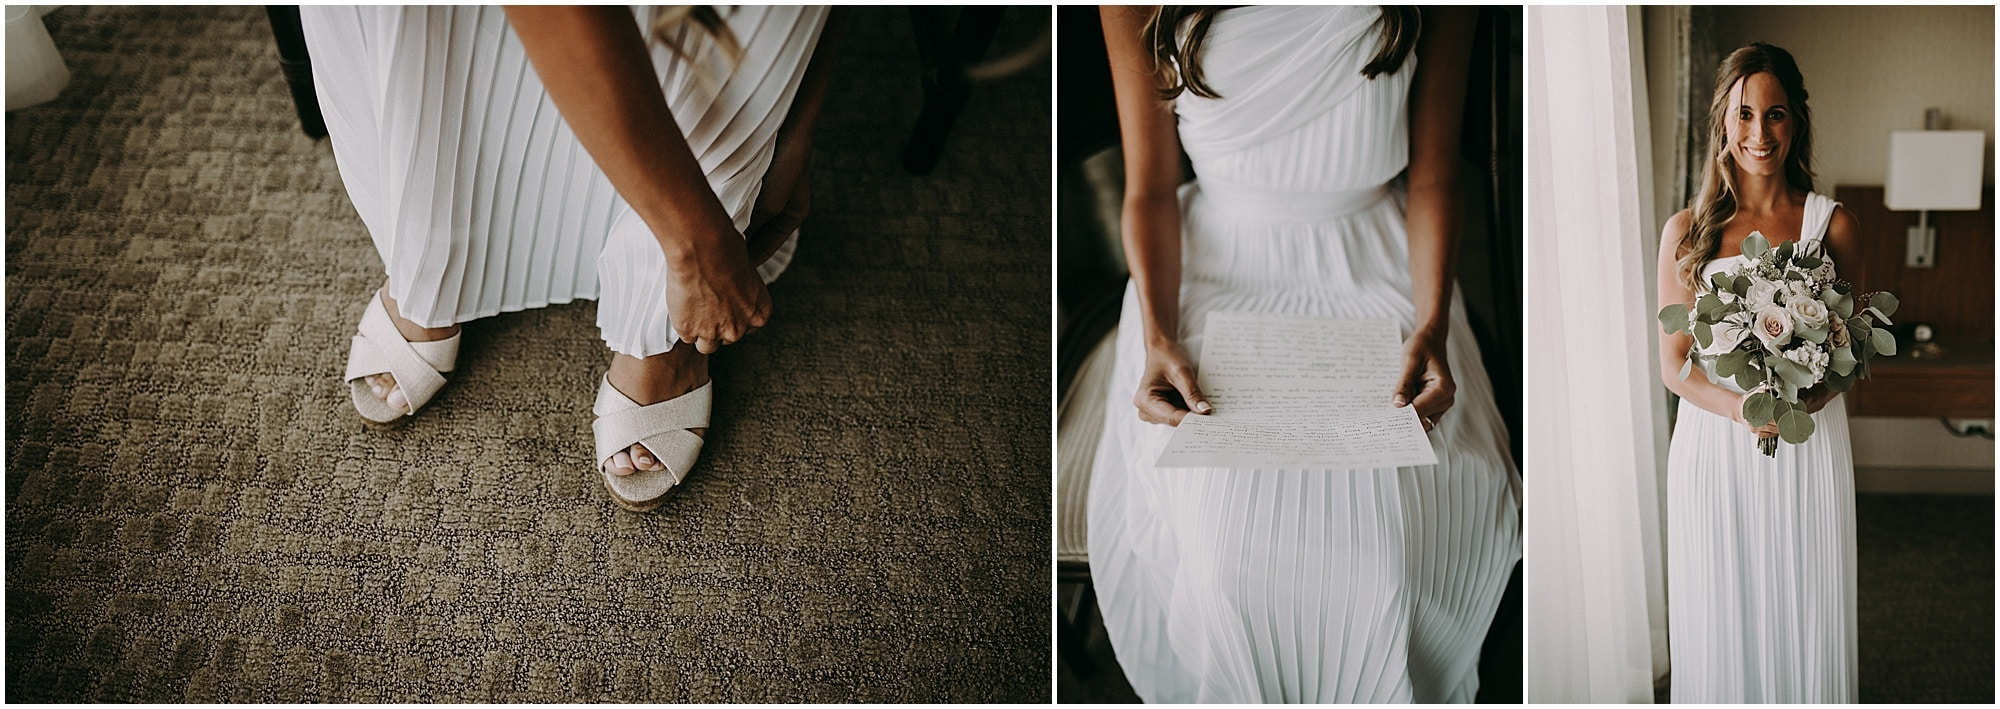 Maui wedding photographer4